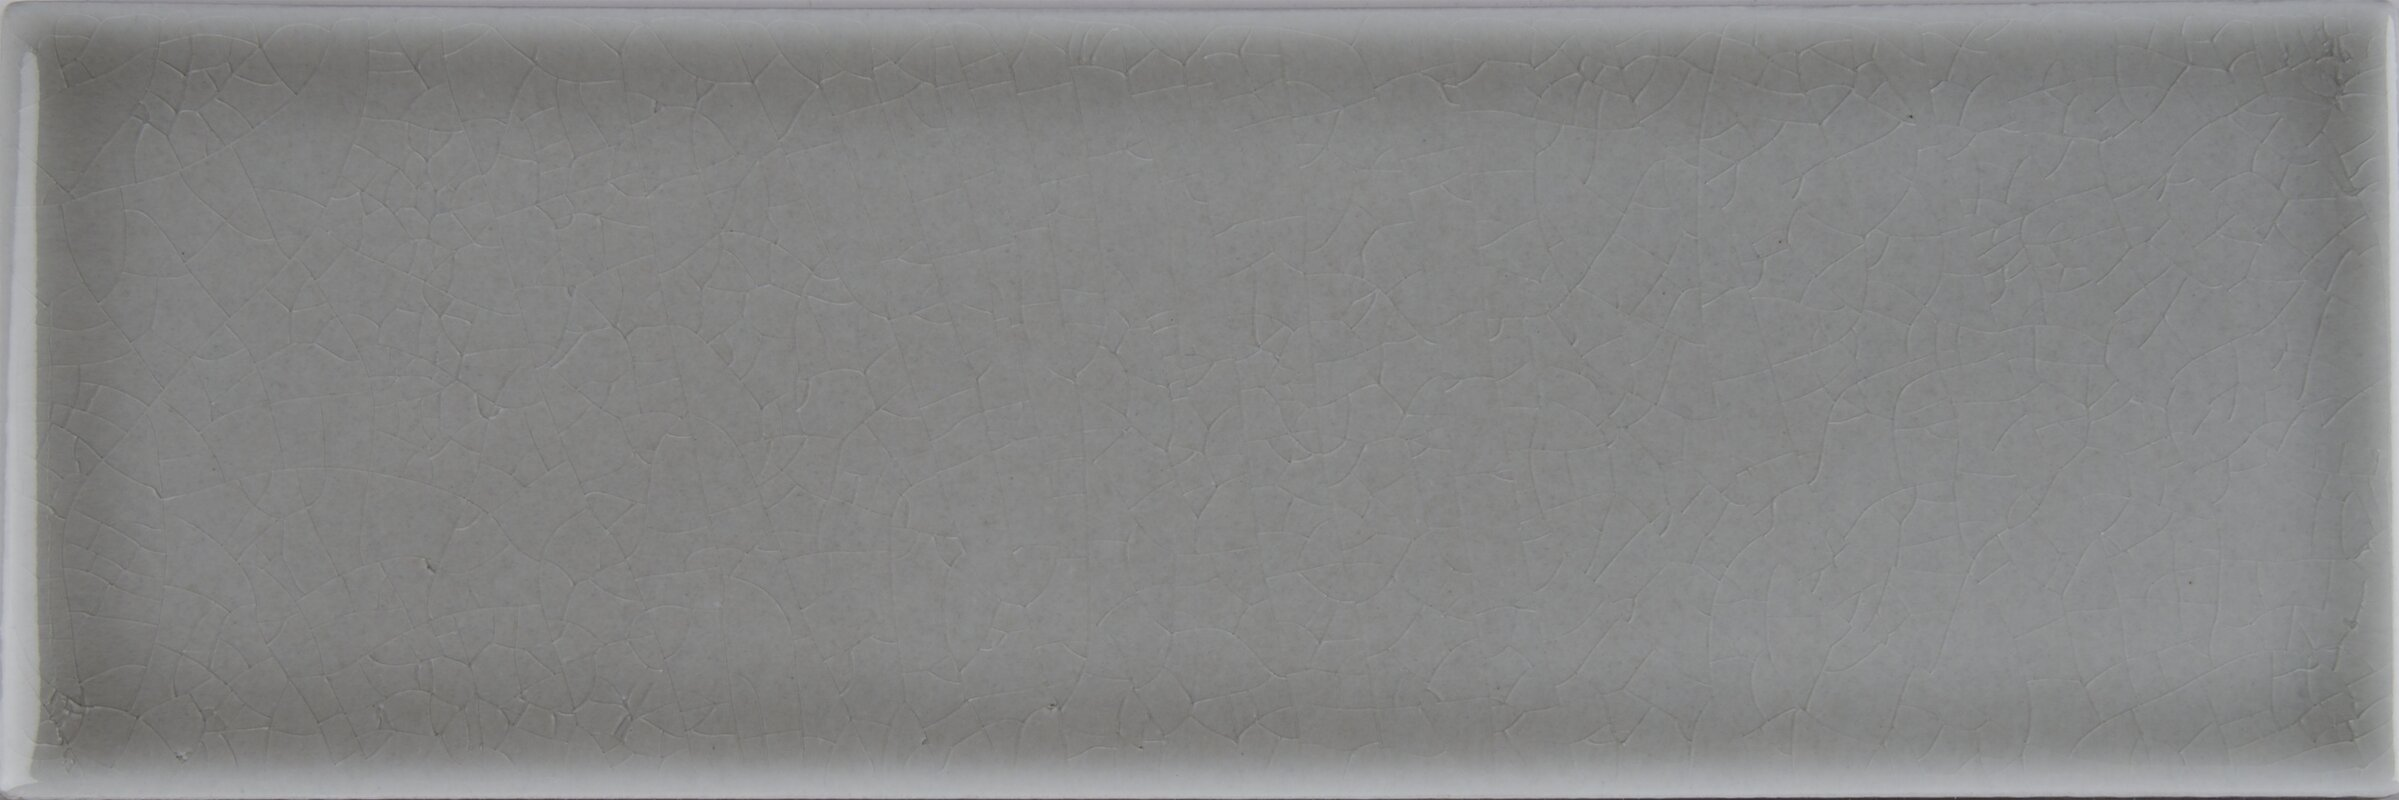 MSI 4 x 12 Ceramic Wall Tile in Dove Gray Wayfair